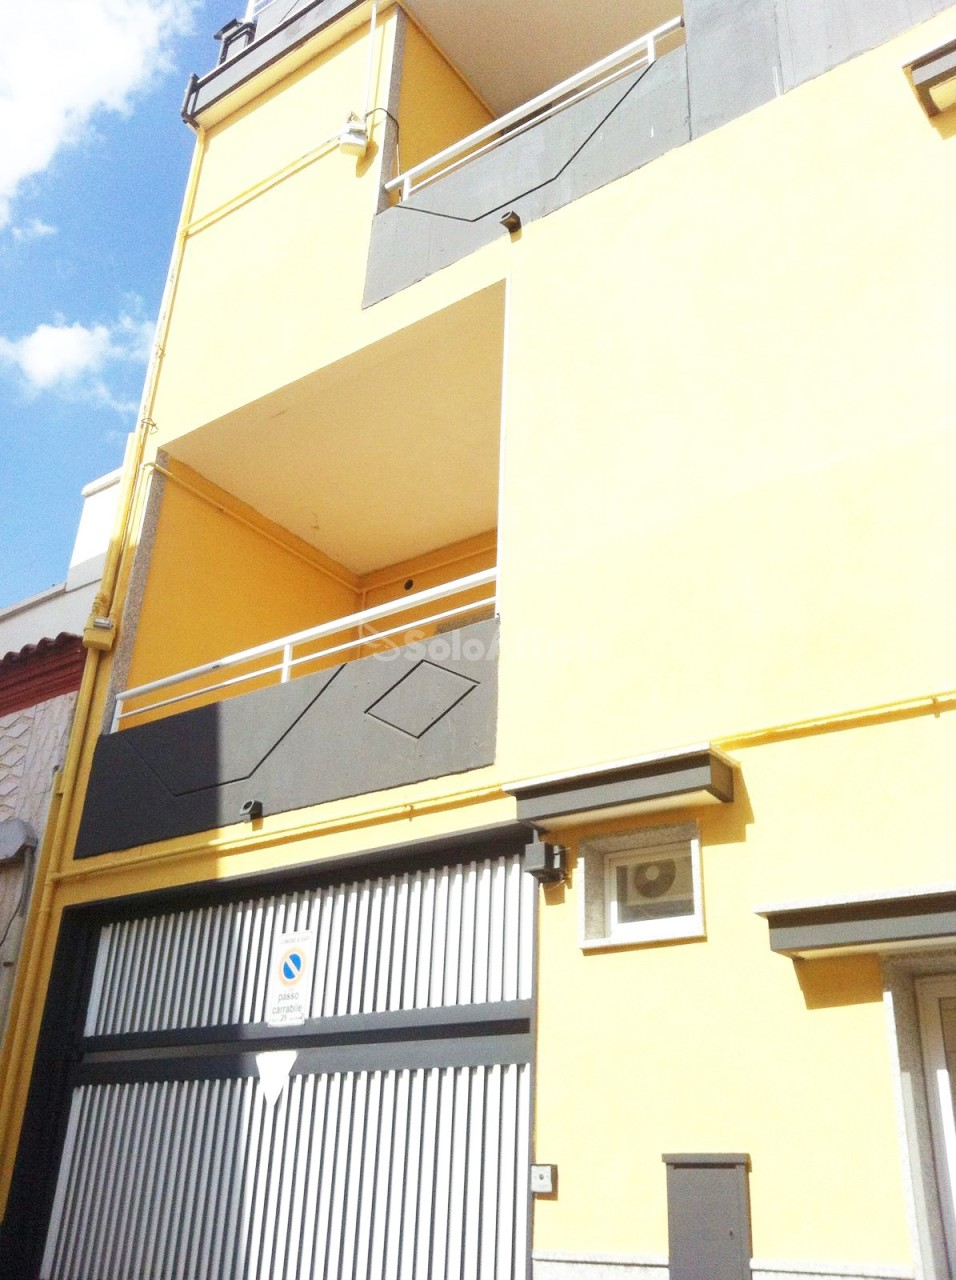 Appartamento in affitto a Carbonara, Bari (BA)